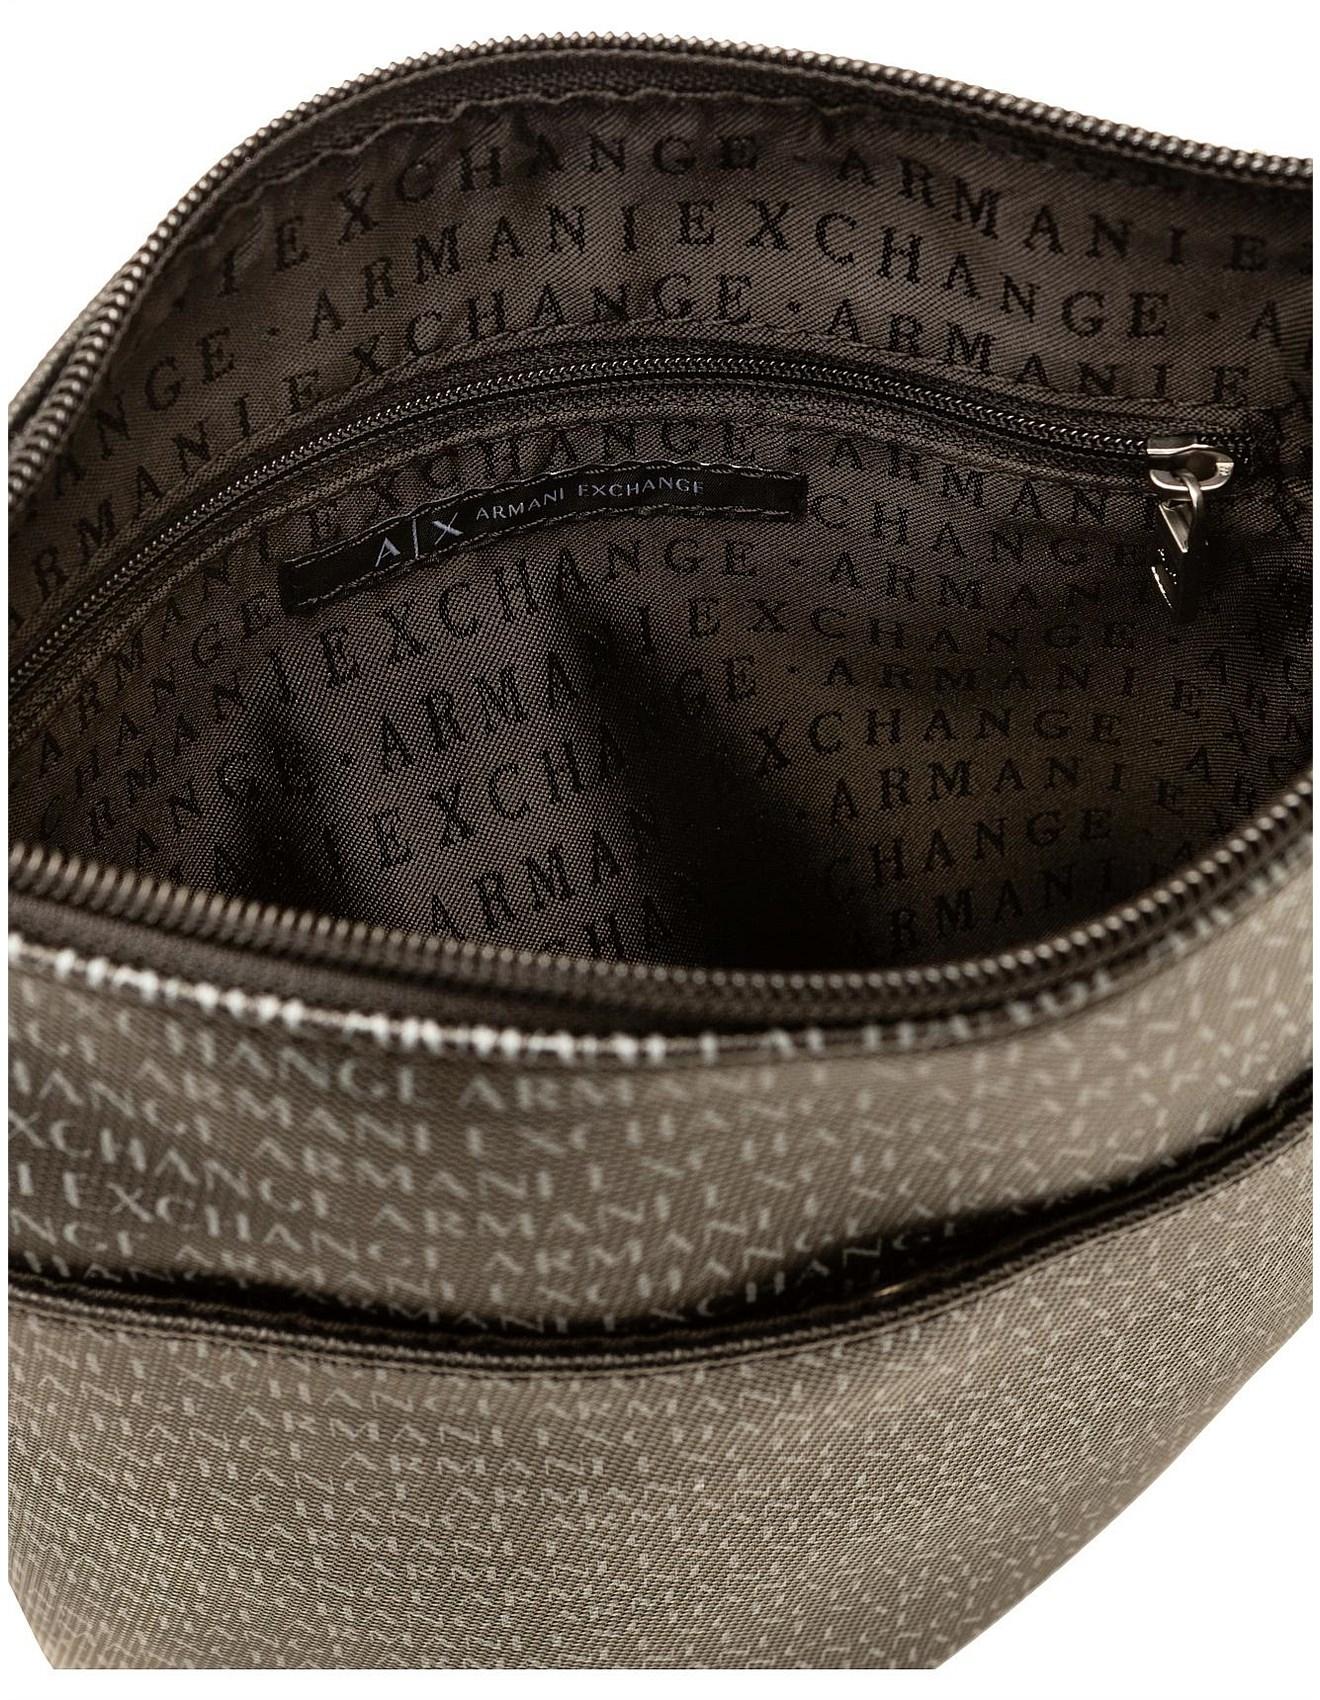 2da6913e655 Bags & Accessories Sale | Buy Handbags Online | David Jones - ARMANI ...